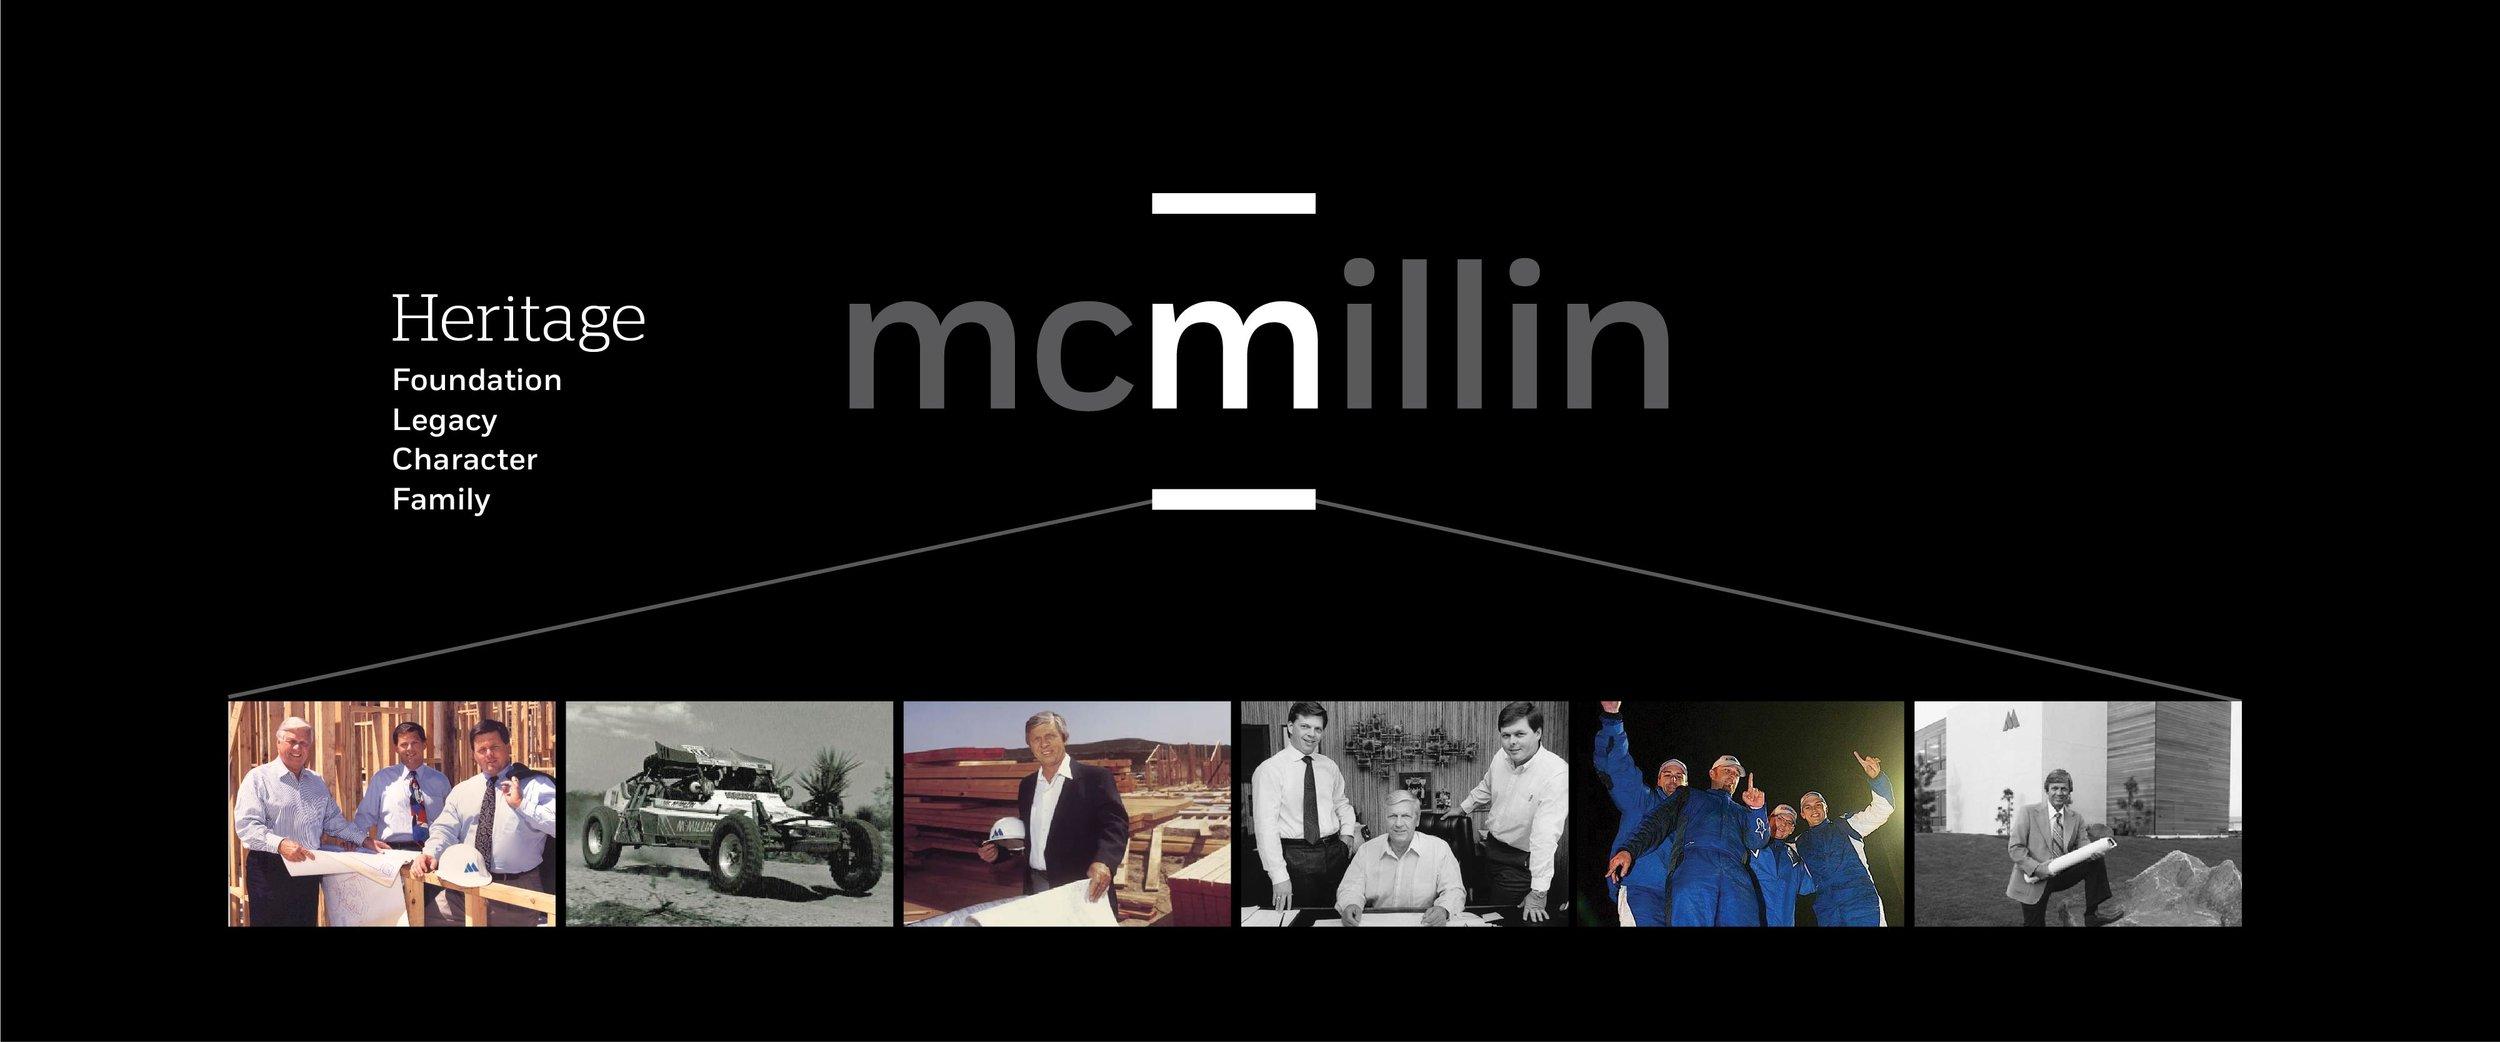 mcmillin heritag-01.jpg